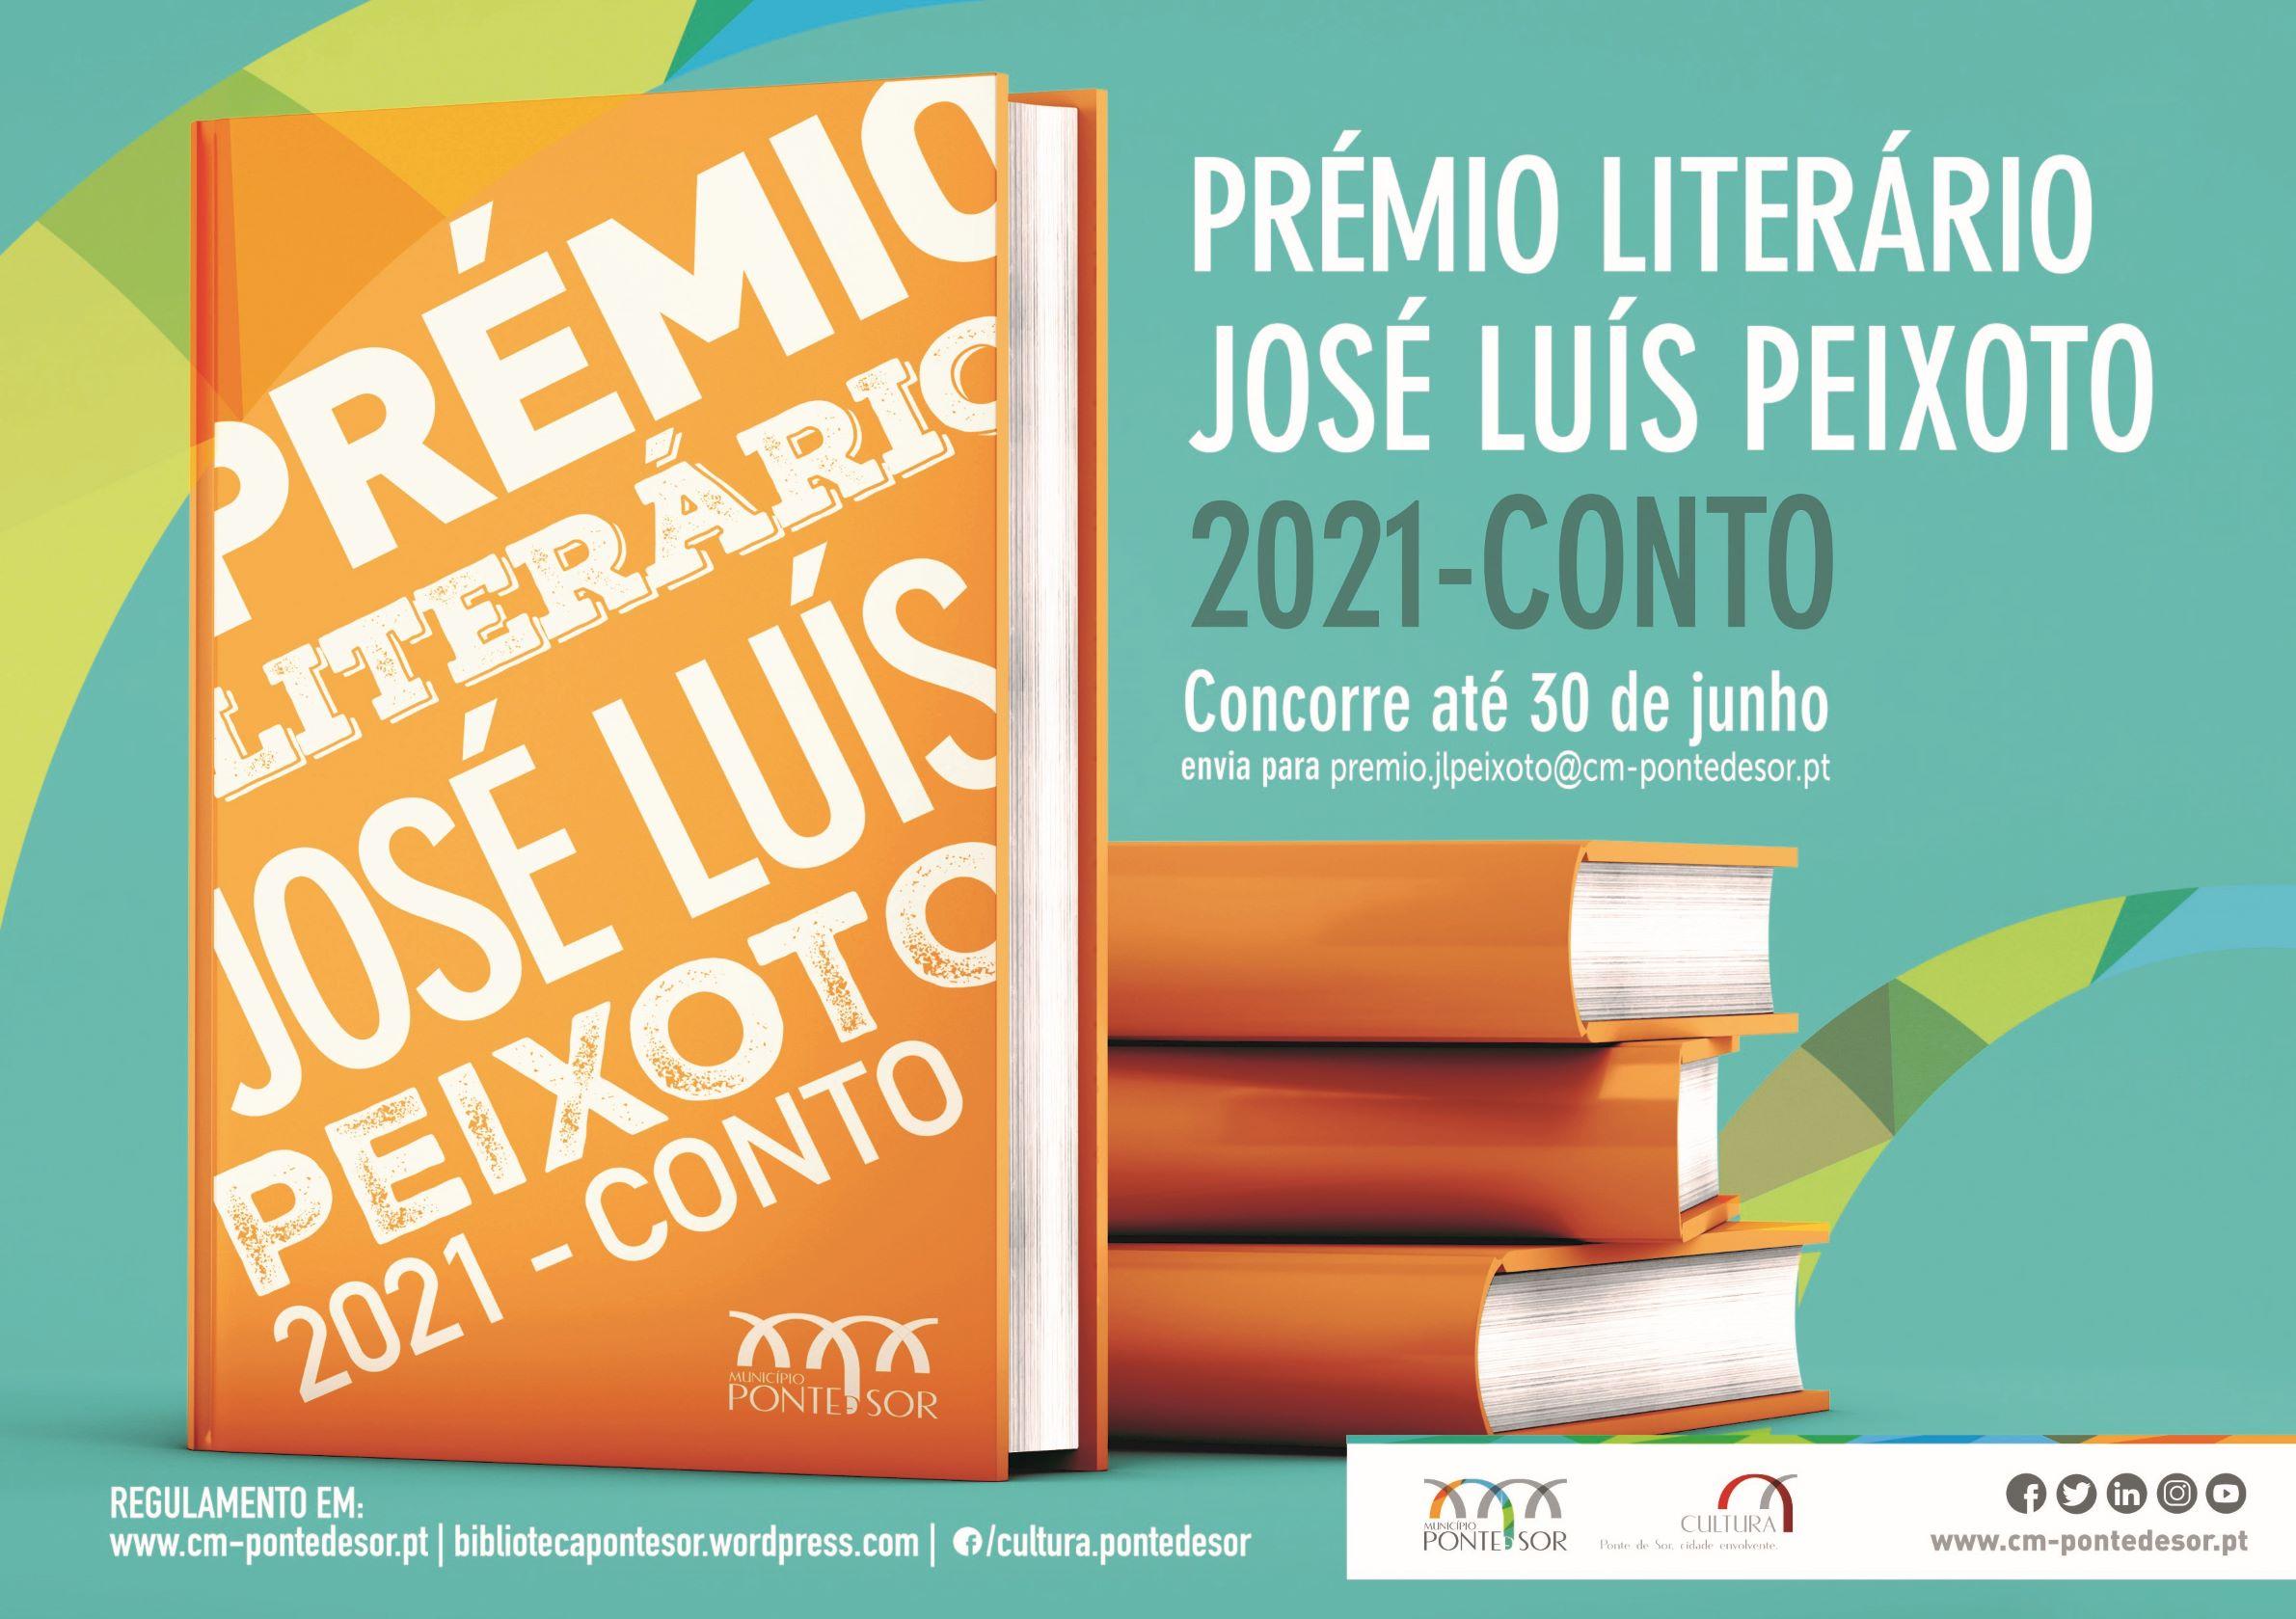 Prémio Literário José Luís Peixoto